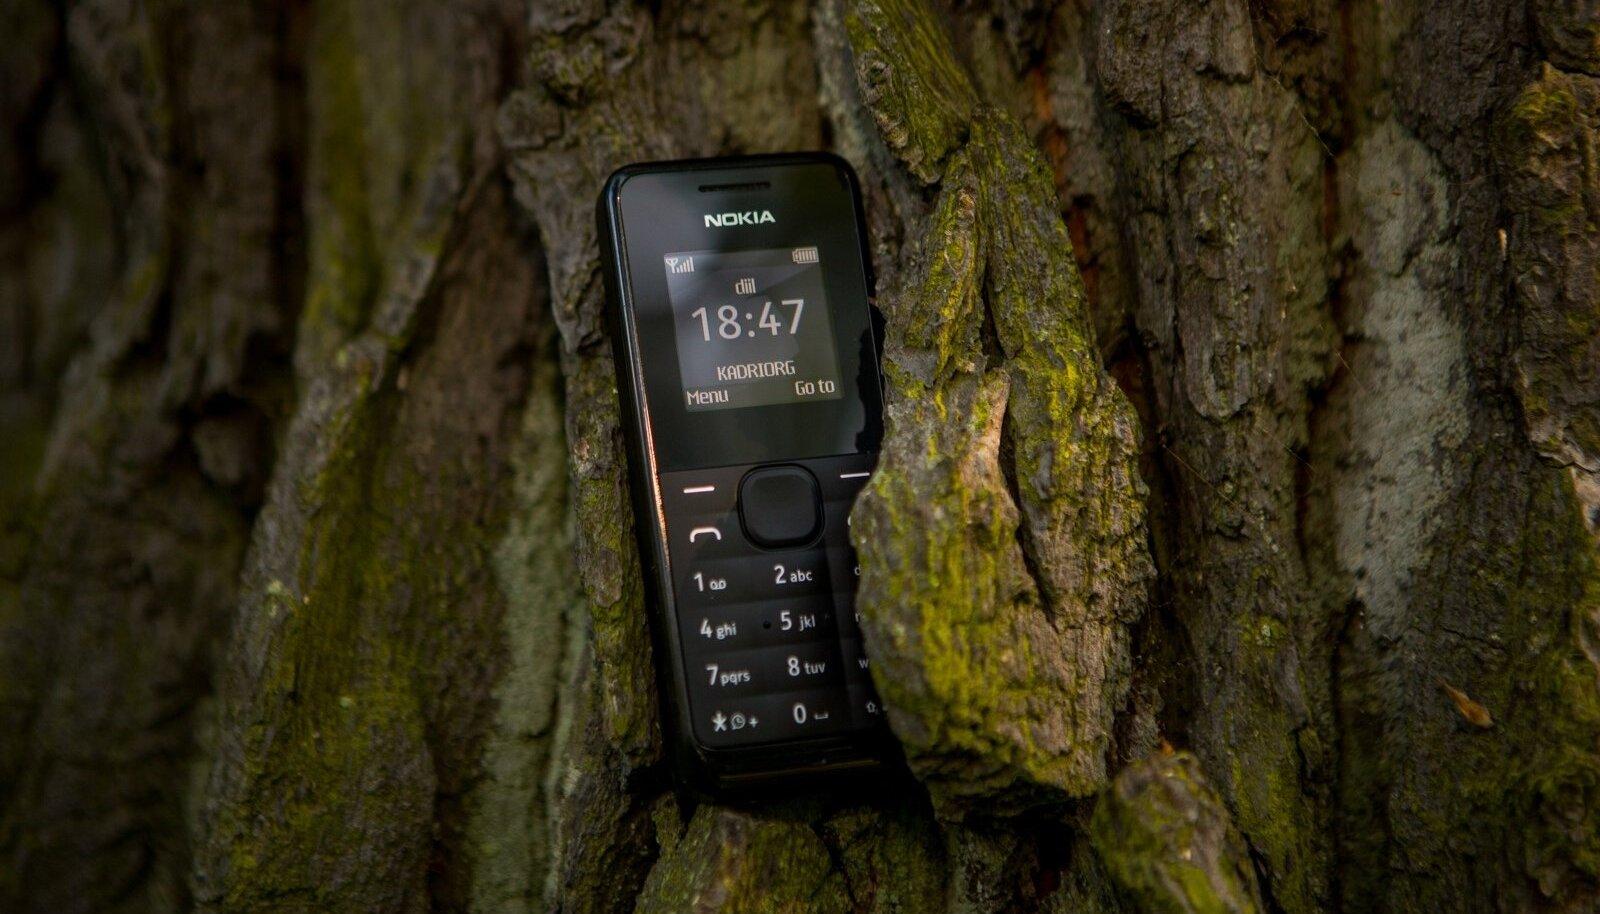 Metsamehe Nokia